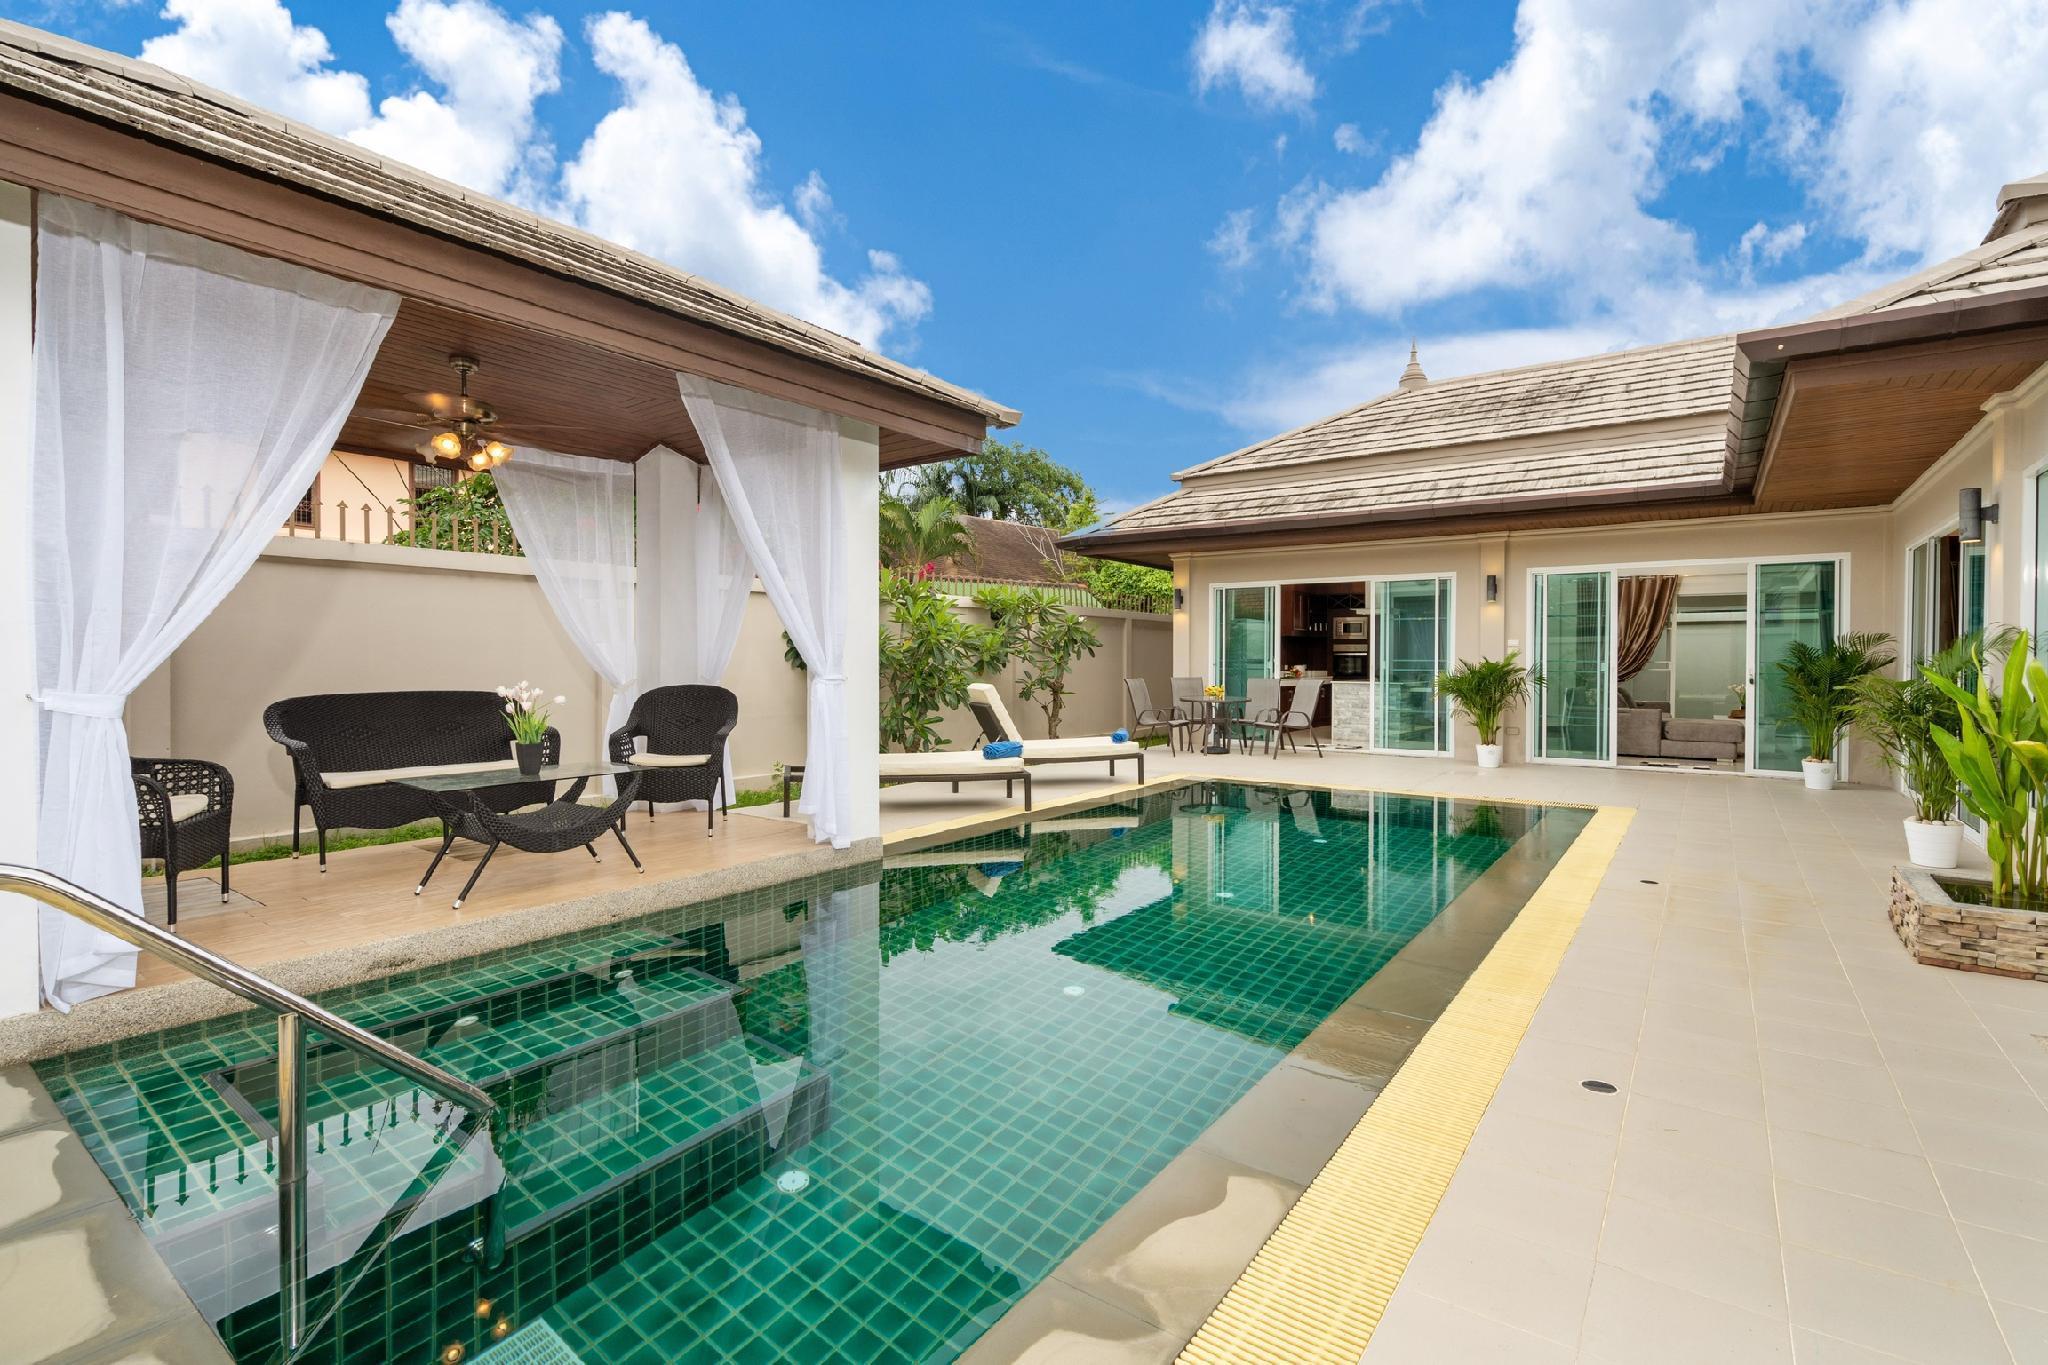 Charming private pool villa วิลลา 2 ห้องนอน 3 ห้องน้ำส่วนตัว ขนาด 290 ตร.ม. – ในหาน